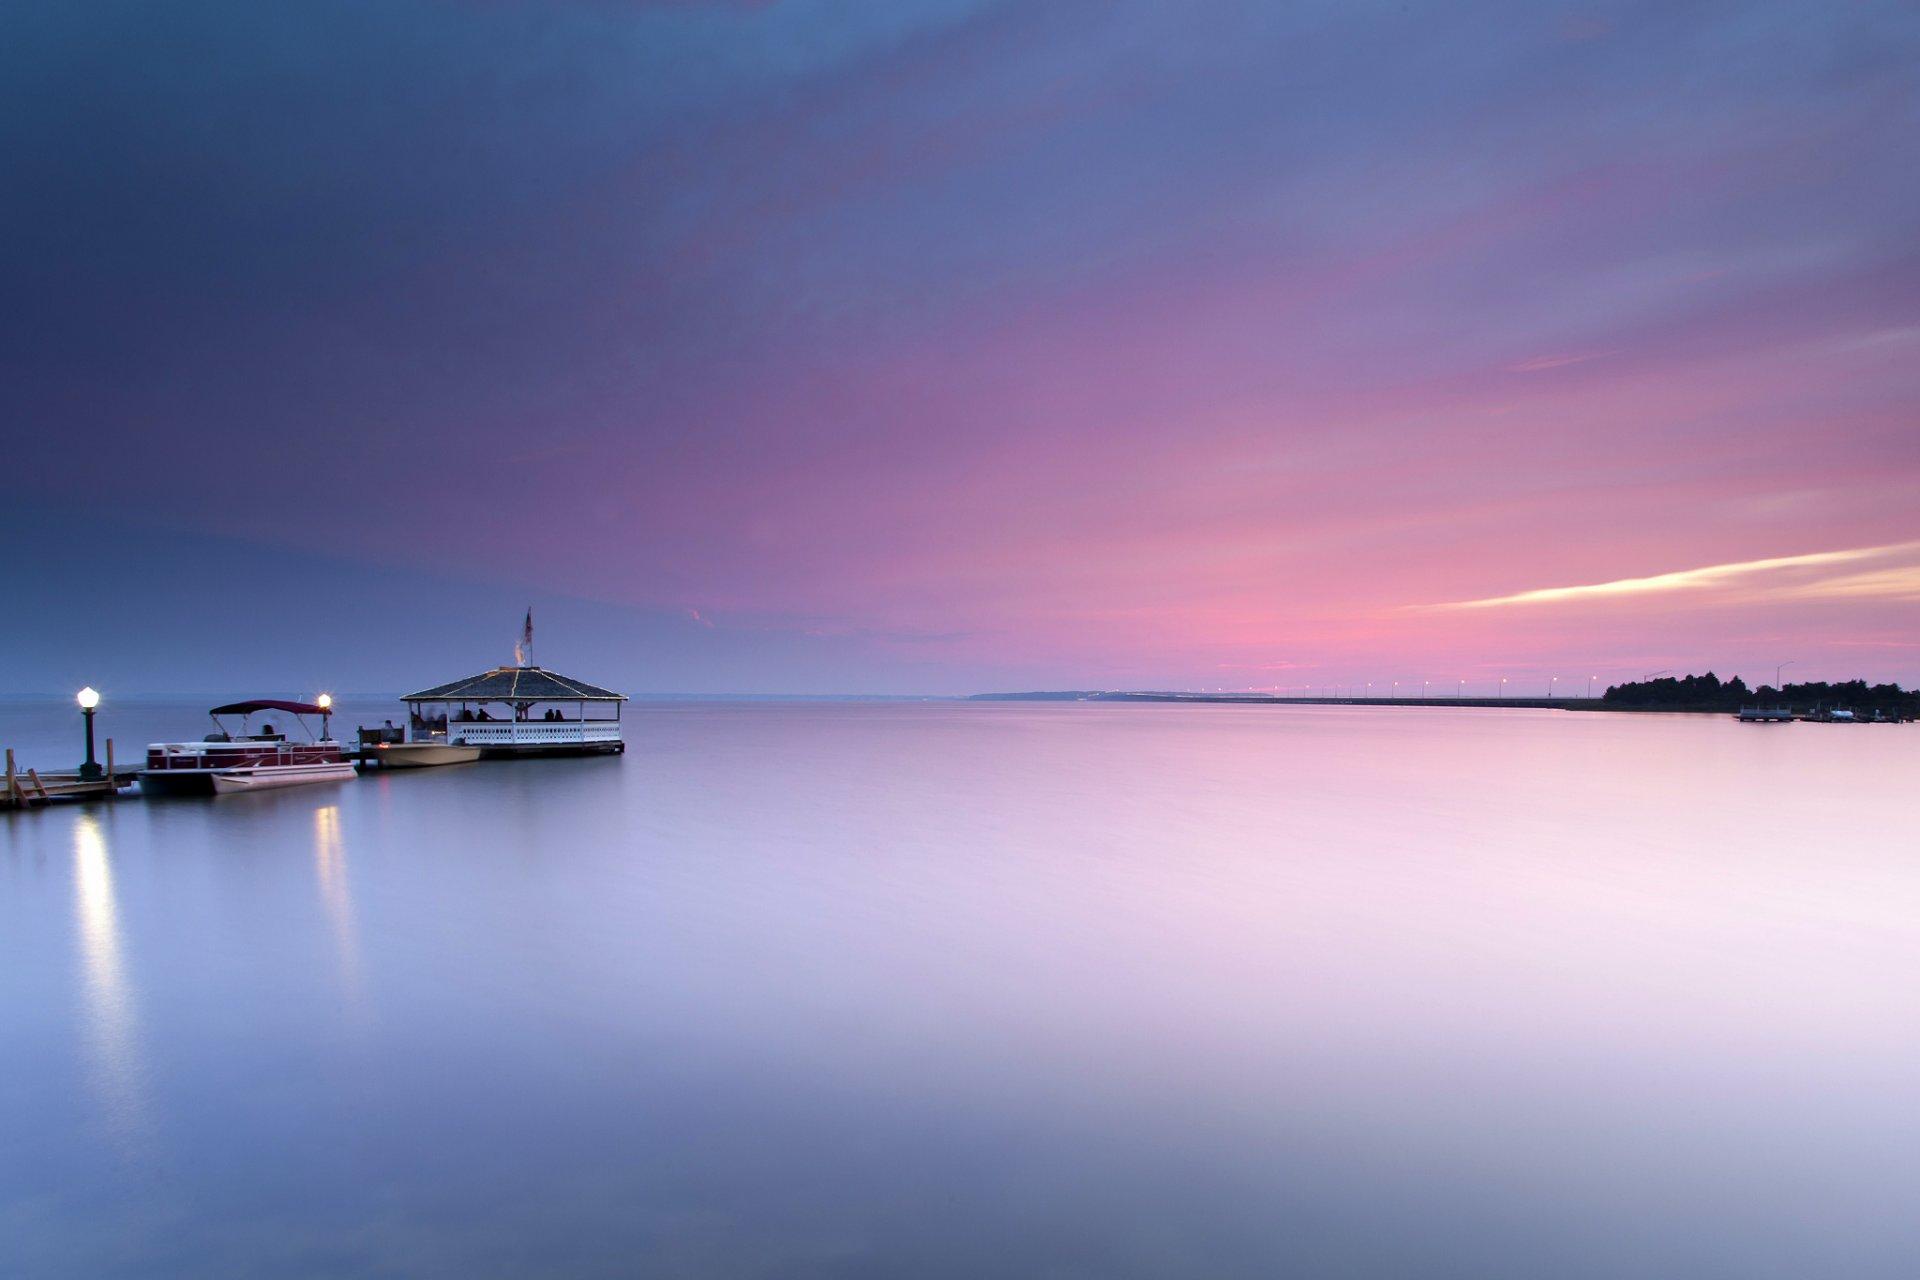 причал фонари берег море pier lights shore sea  № 2555067 загрузить